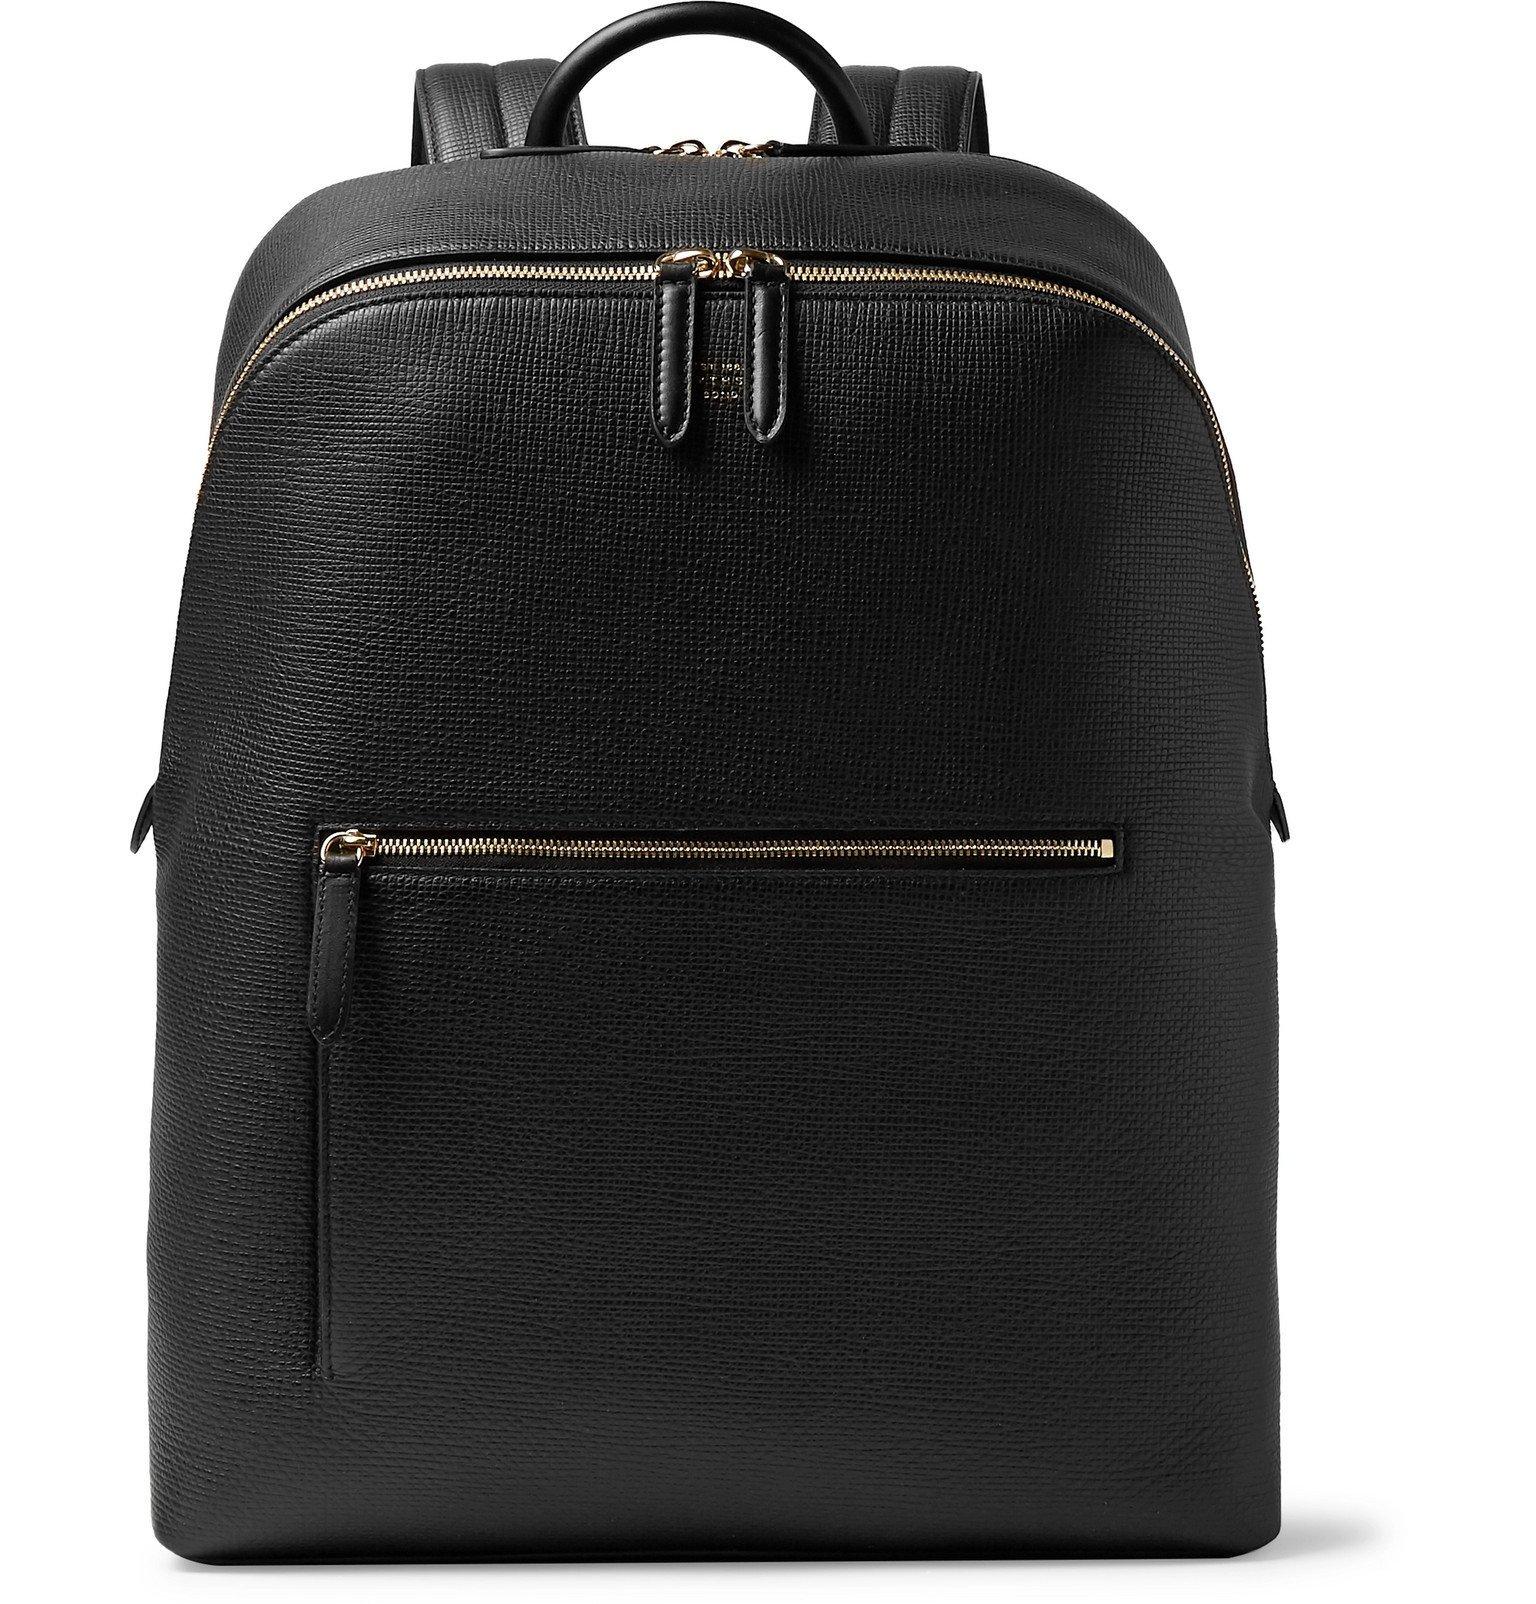 Smythson - Panama Cross-Grain Leather Backpack - Black